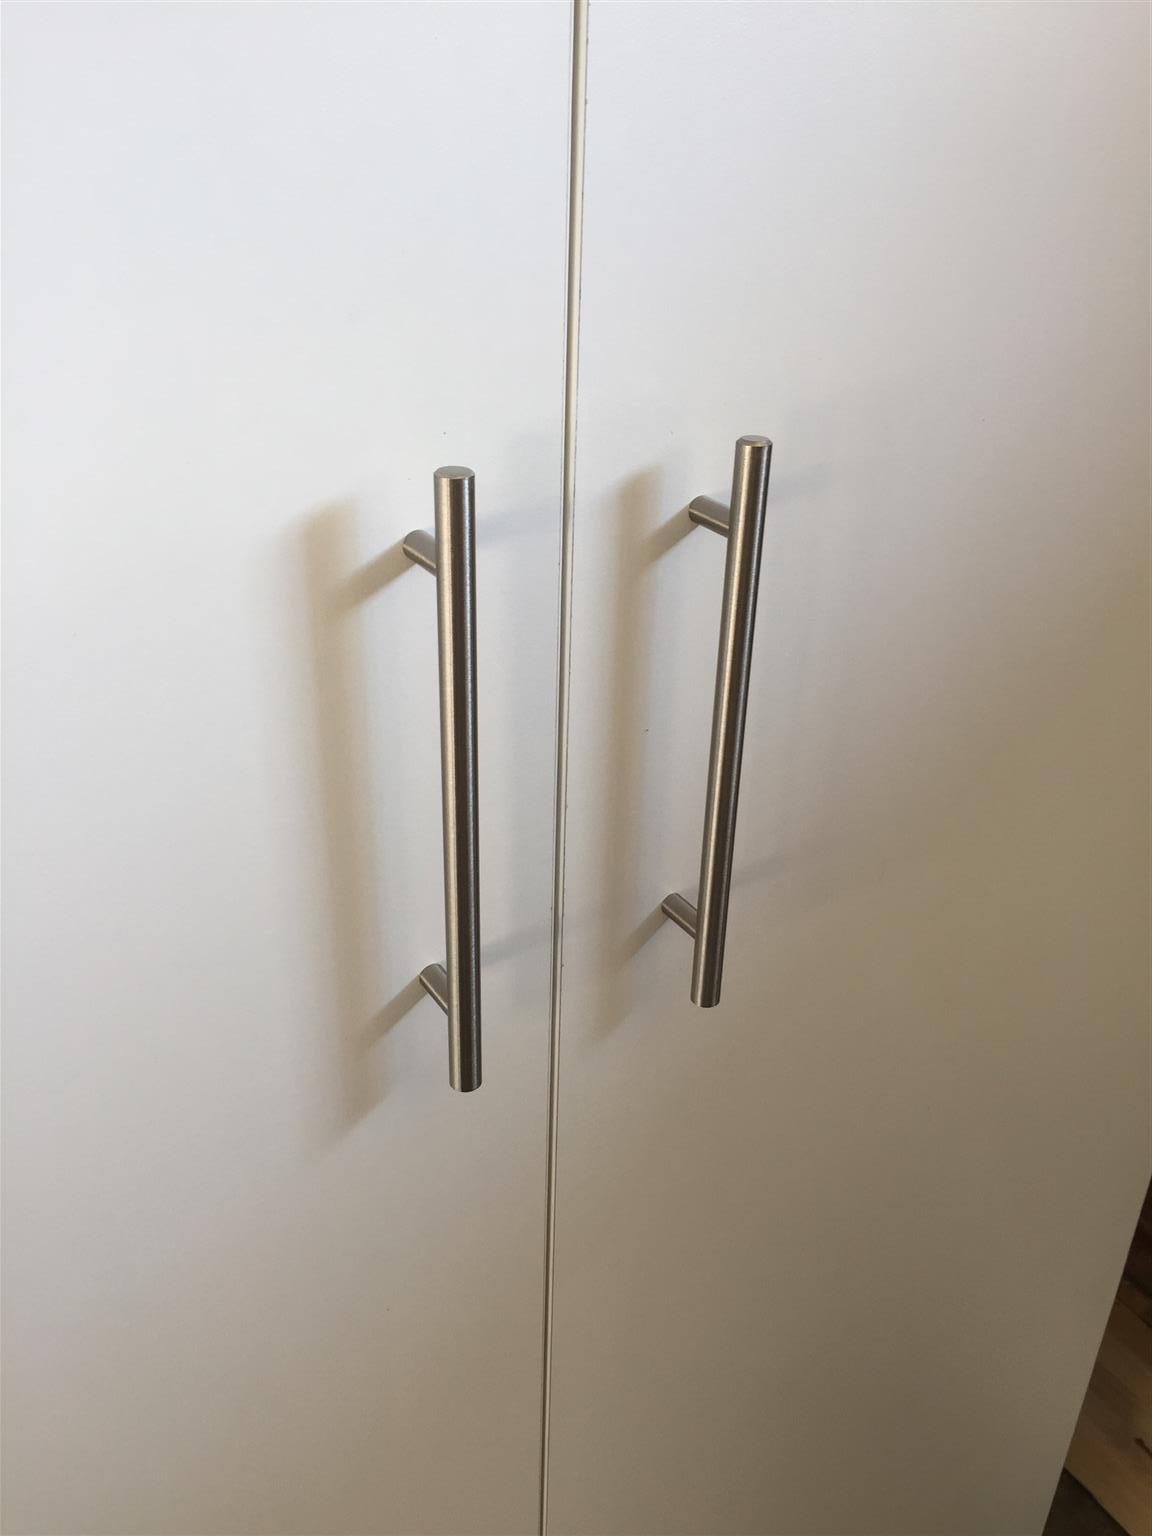 New loose standing cupboard for bedroom